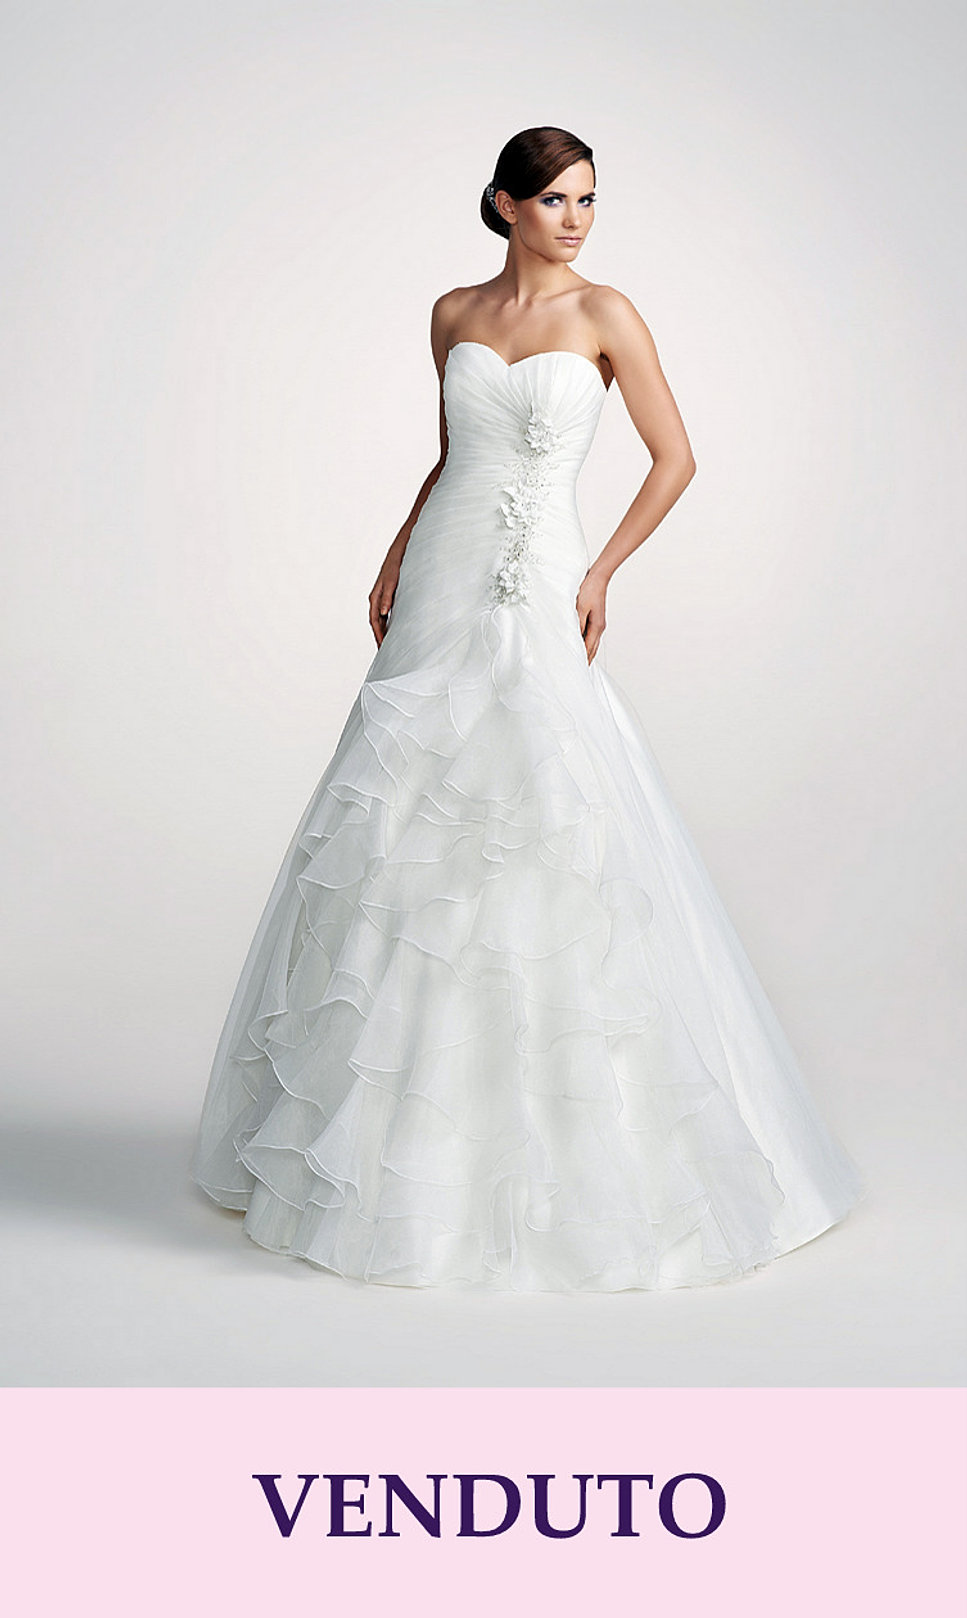 Outlet abiti da sposa ravenna